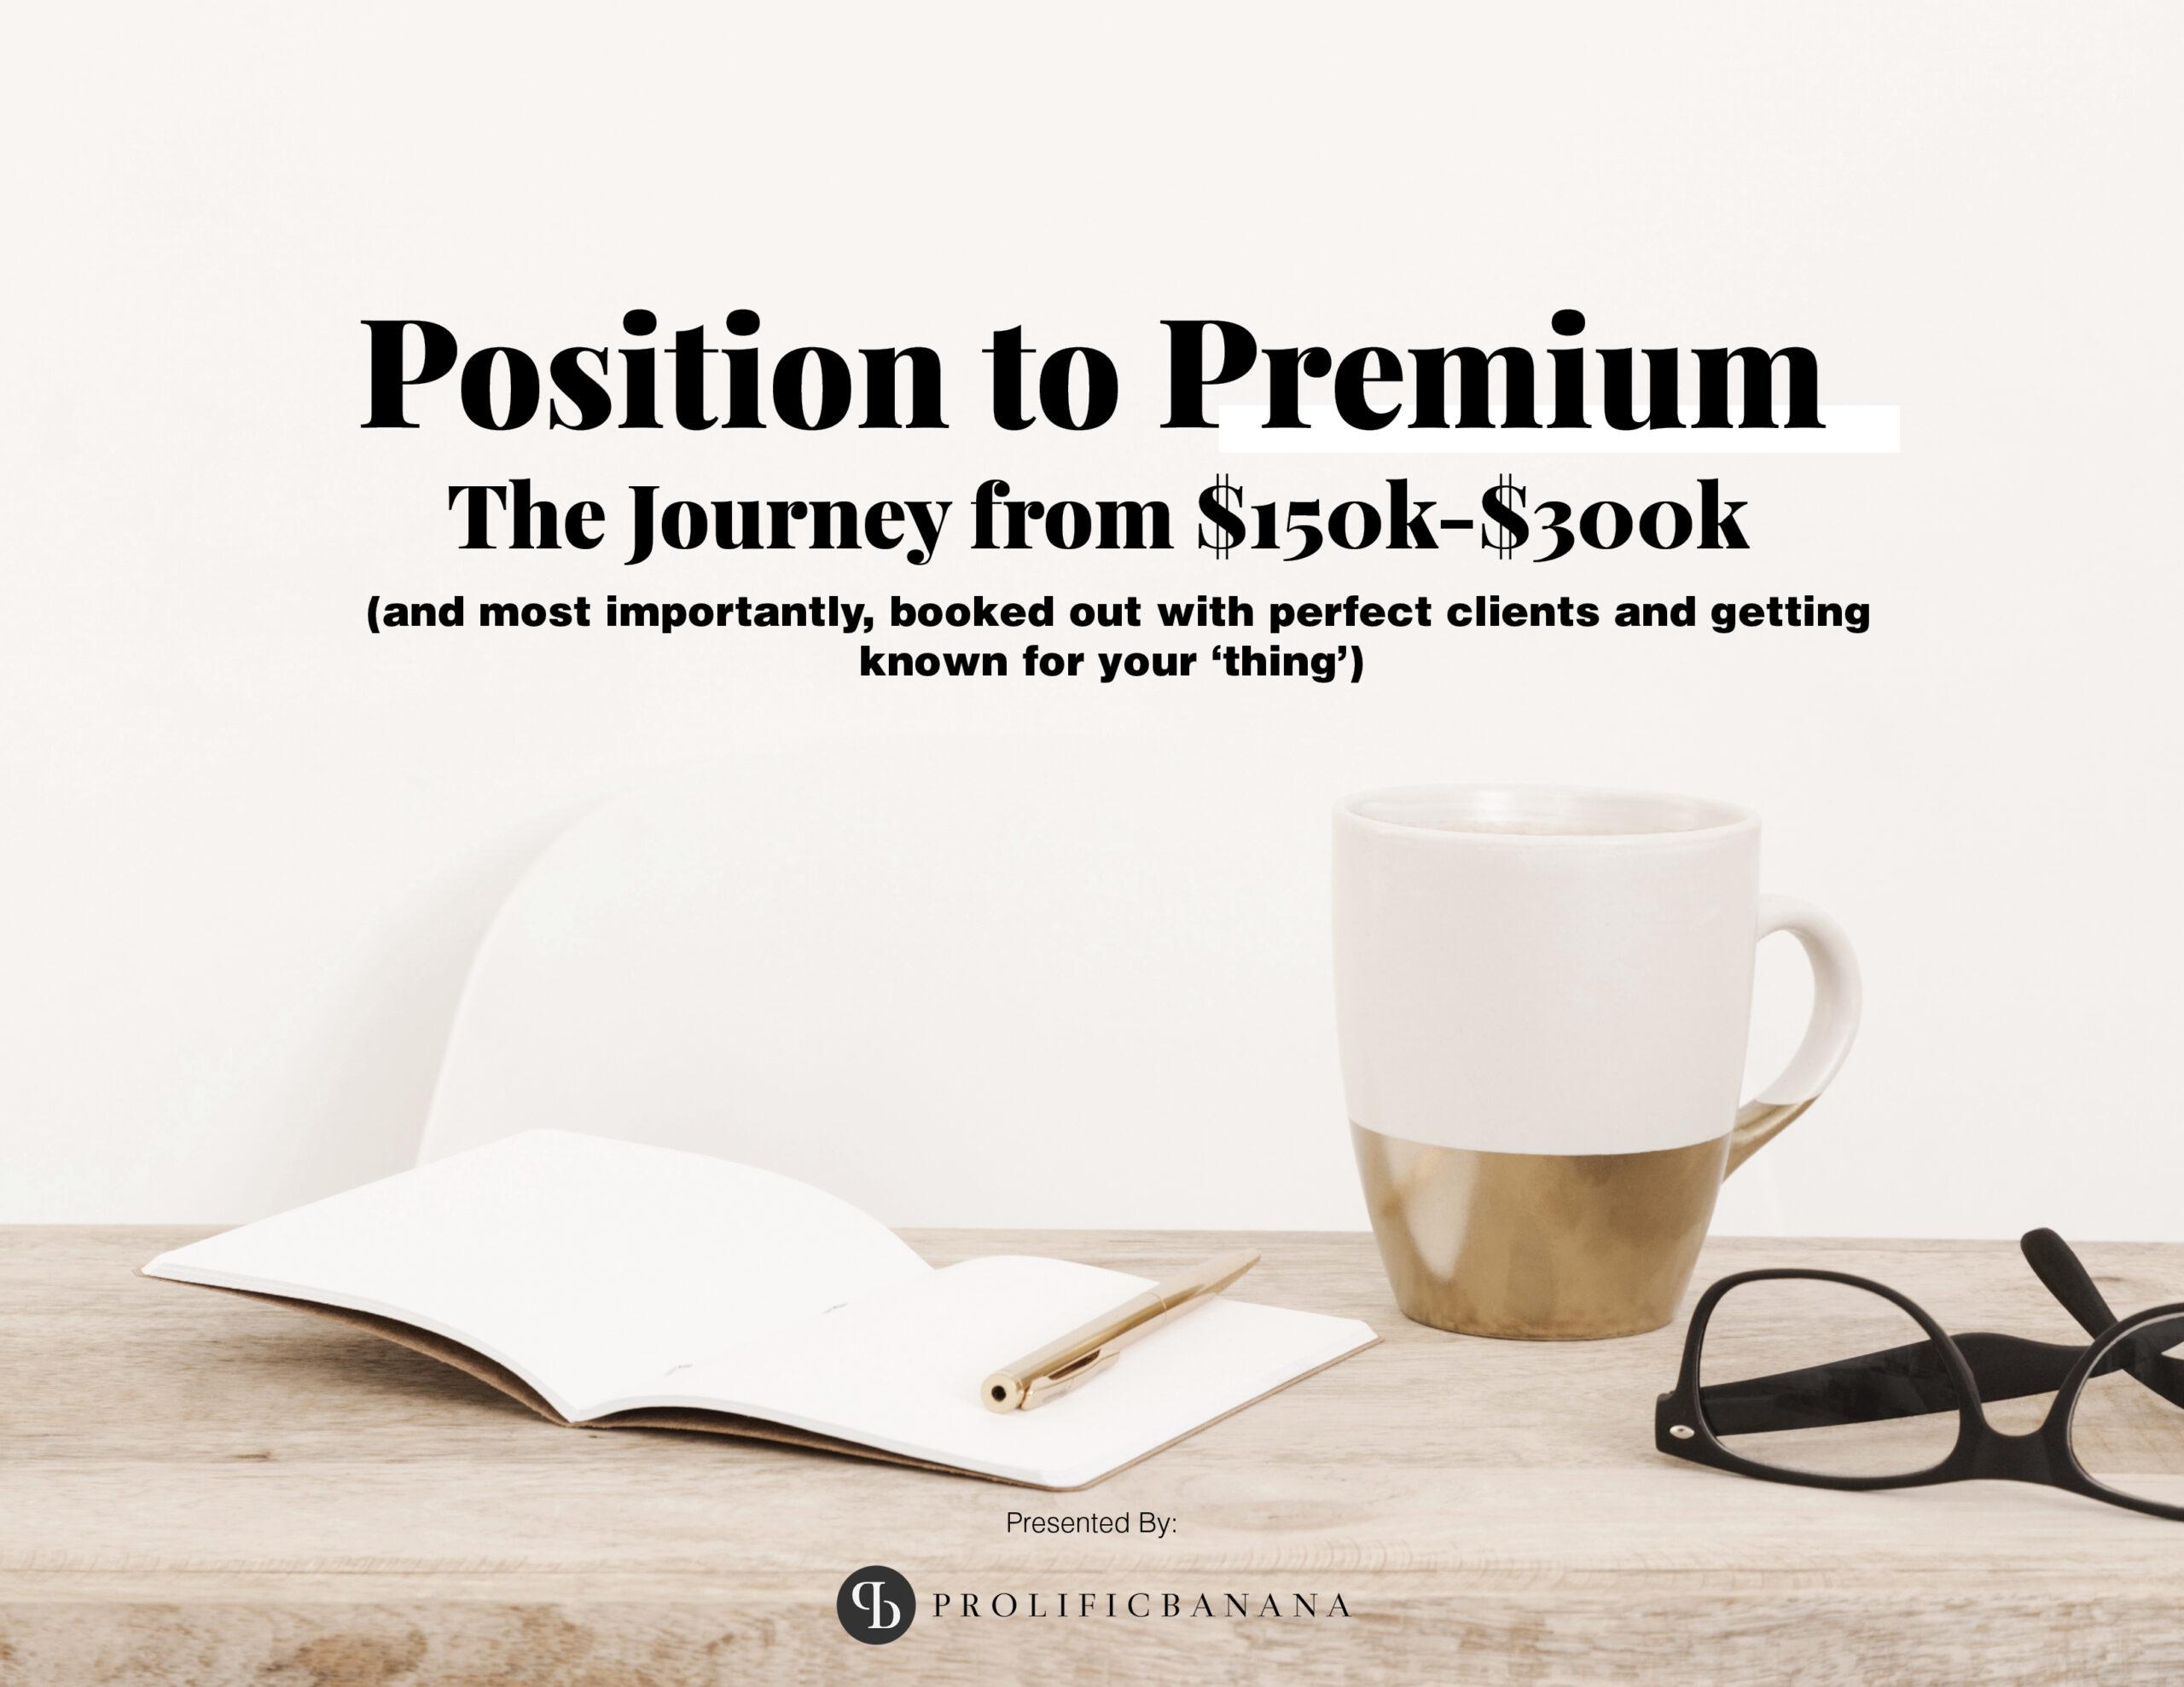 Position to Premium Checklist